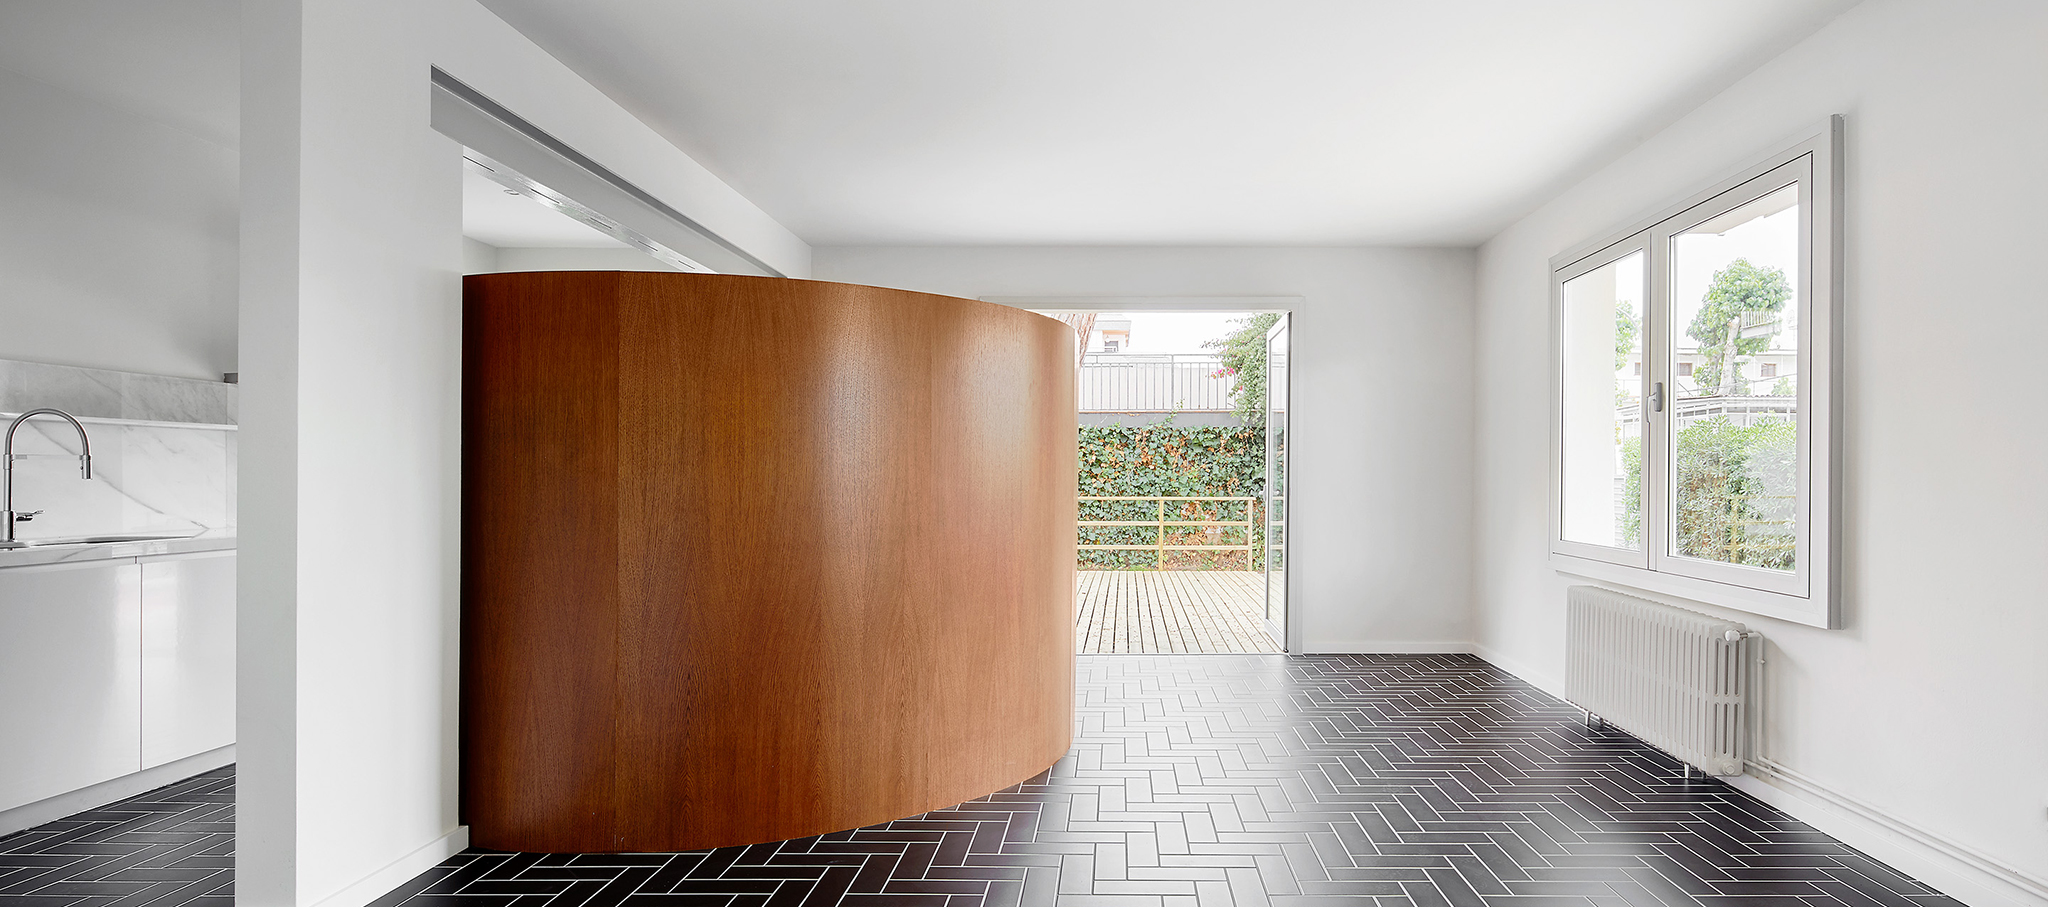 Casa 1016 por Raúl Sánchez architects. Fotografía © José Hevia